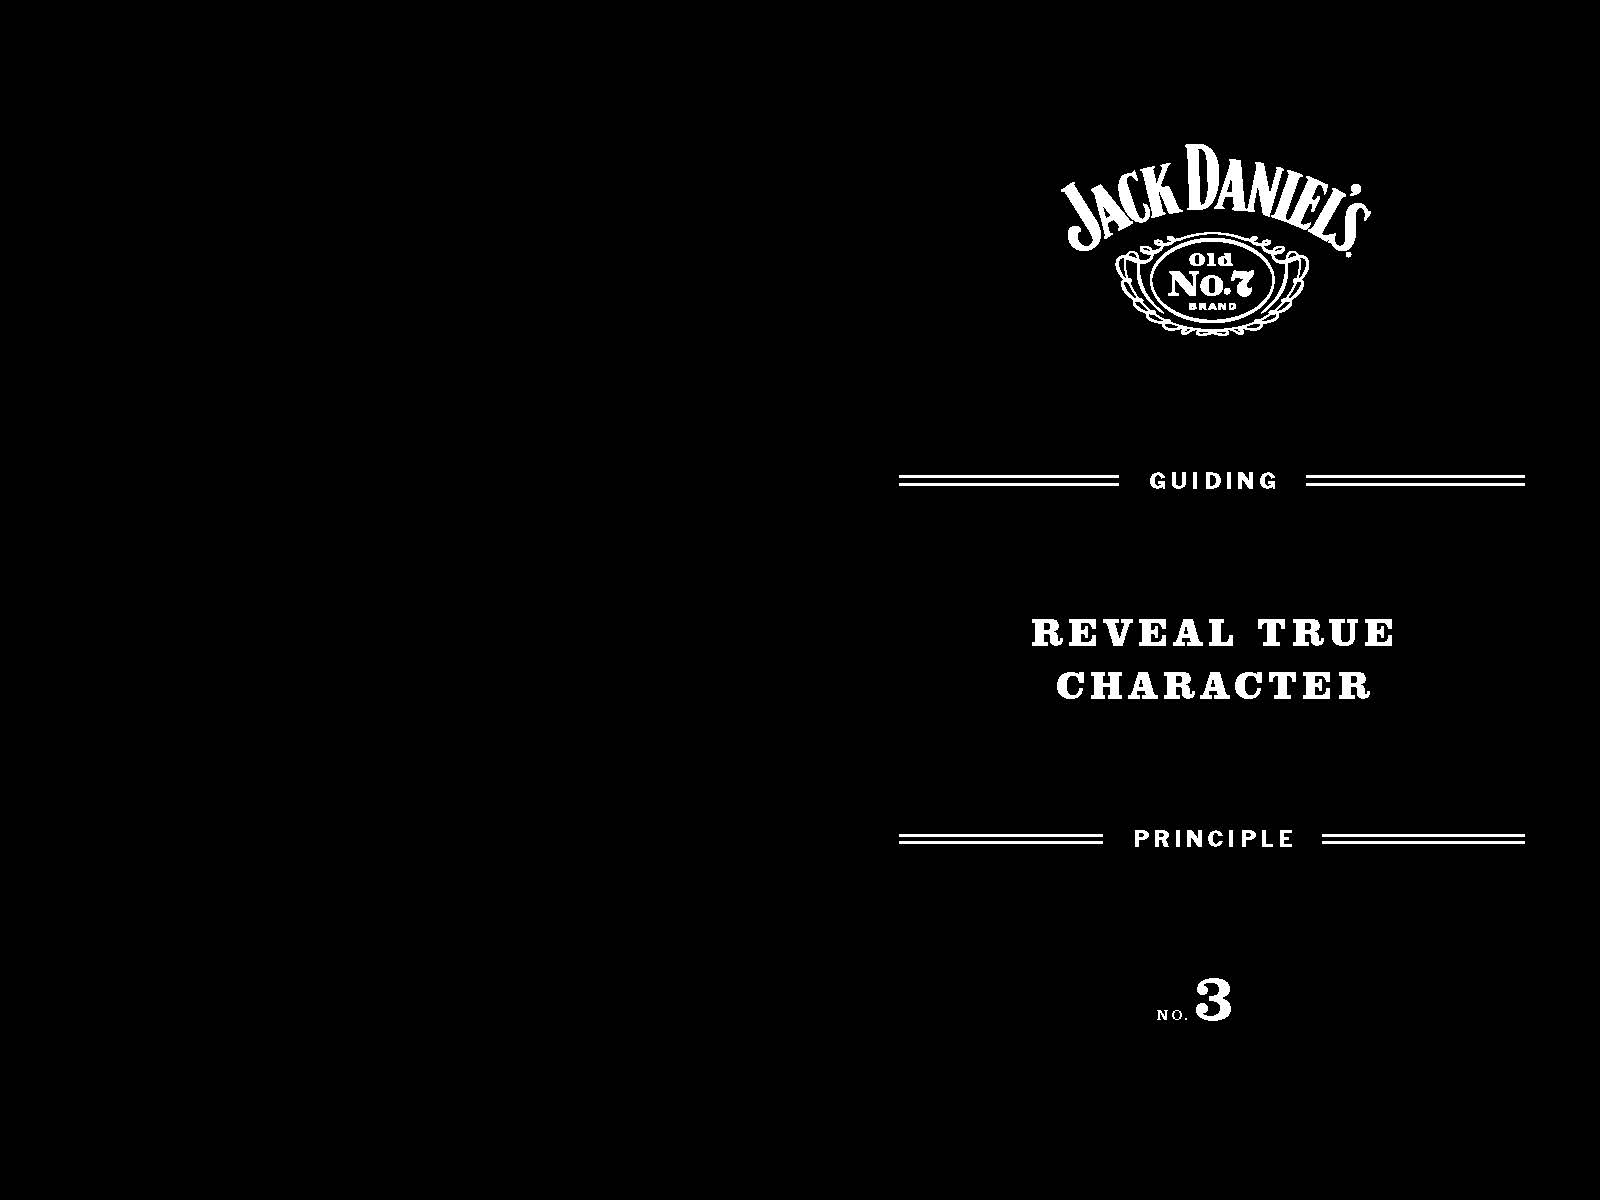 Jack Daniel's Guiding Principles 2012_Page_22.jpg